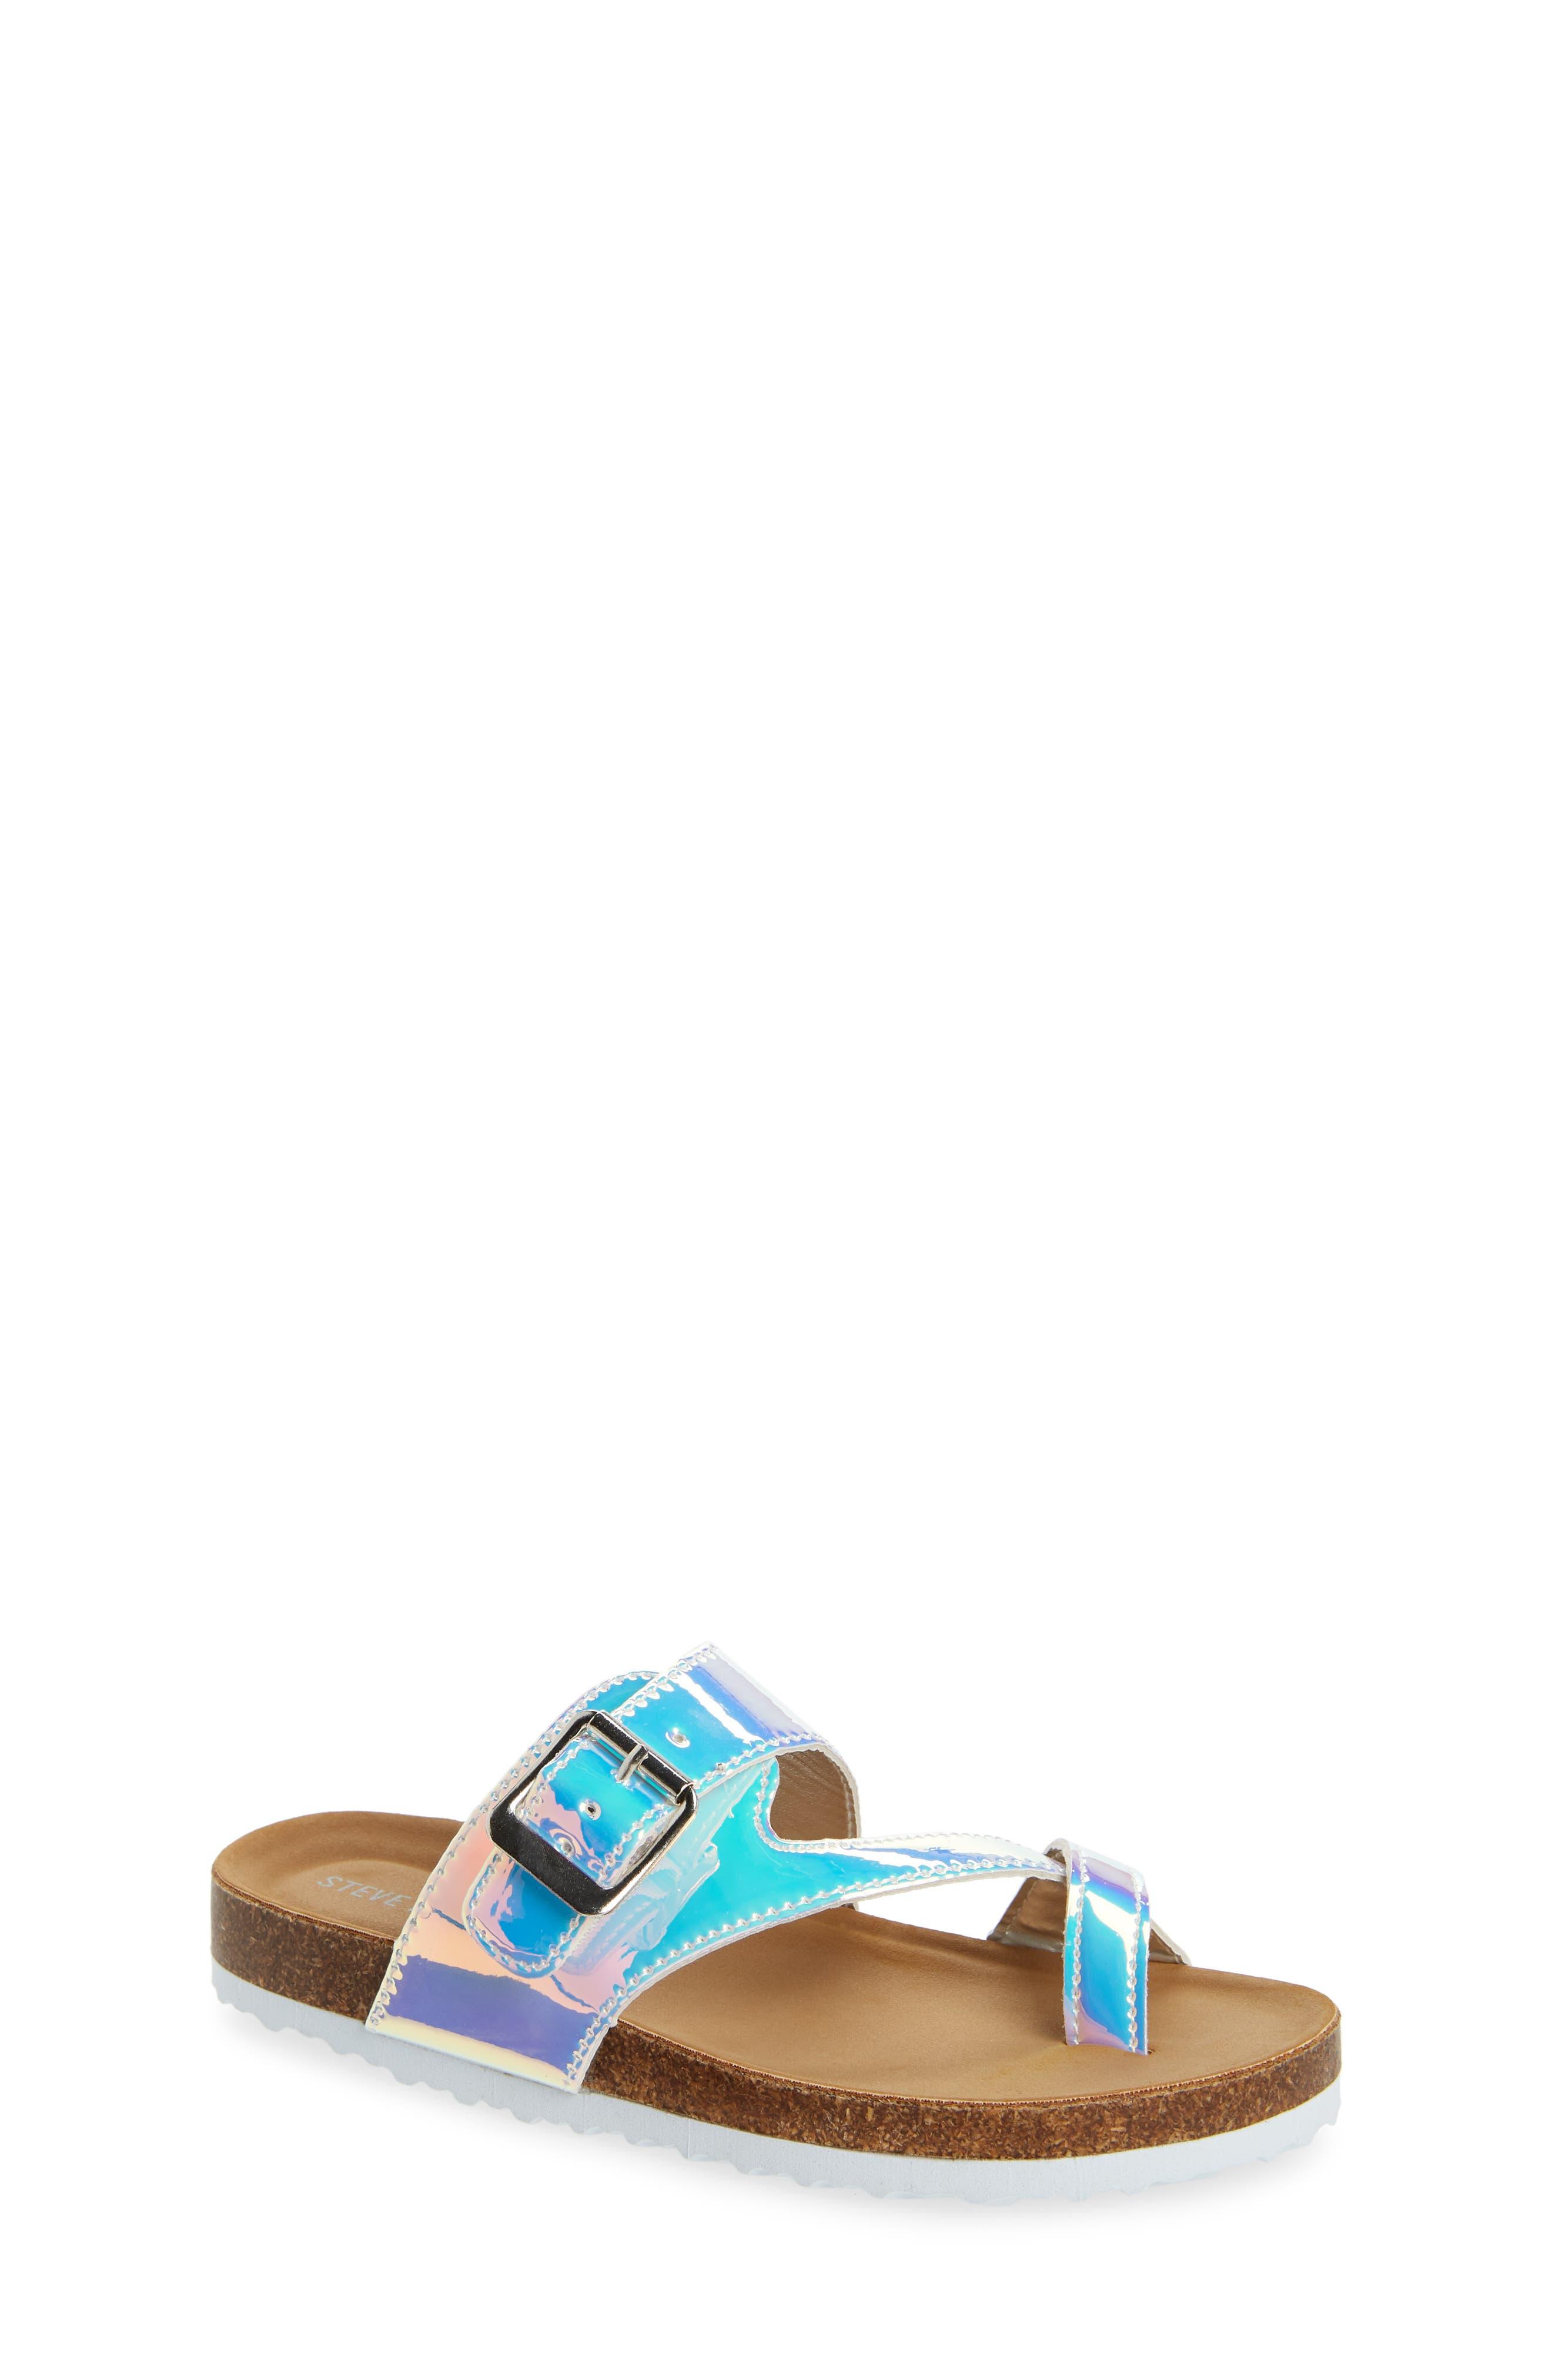 JWaive Sandal, Main, color, IRIDESCENT